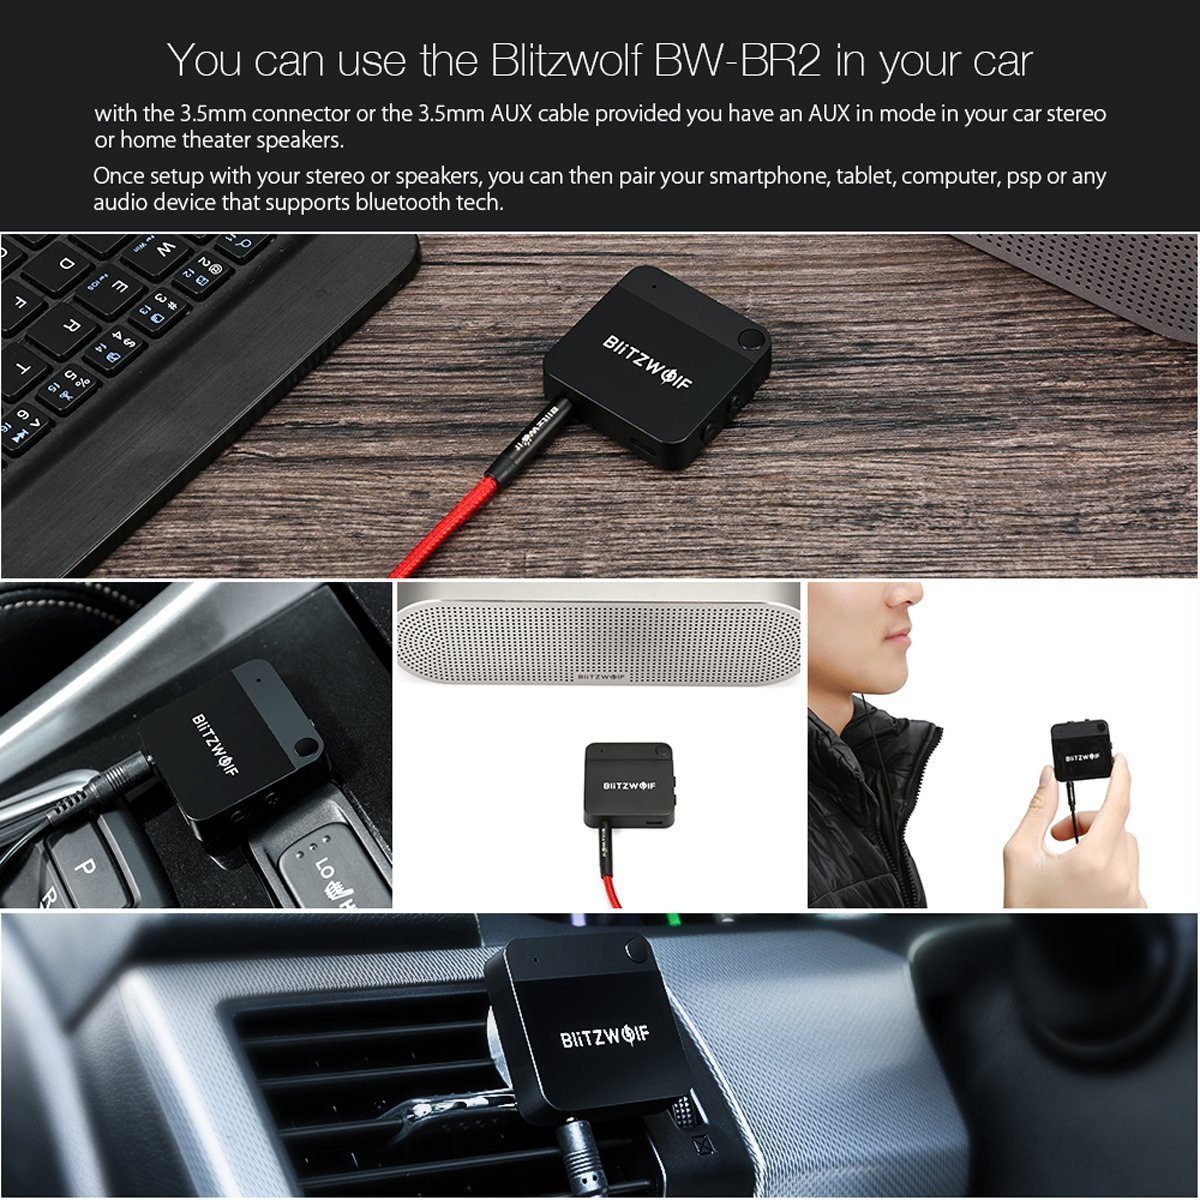 Blitzwolf BW-BR2 Bluetooth reveiver and transmitter